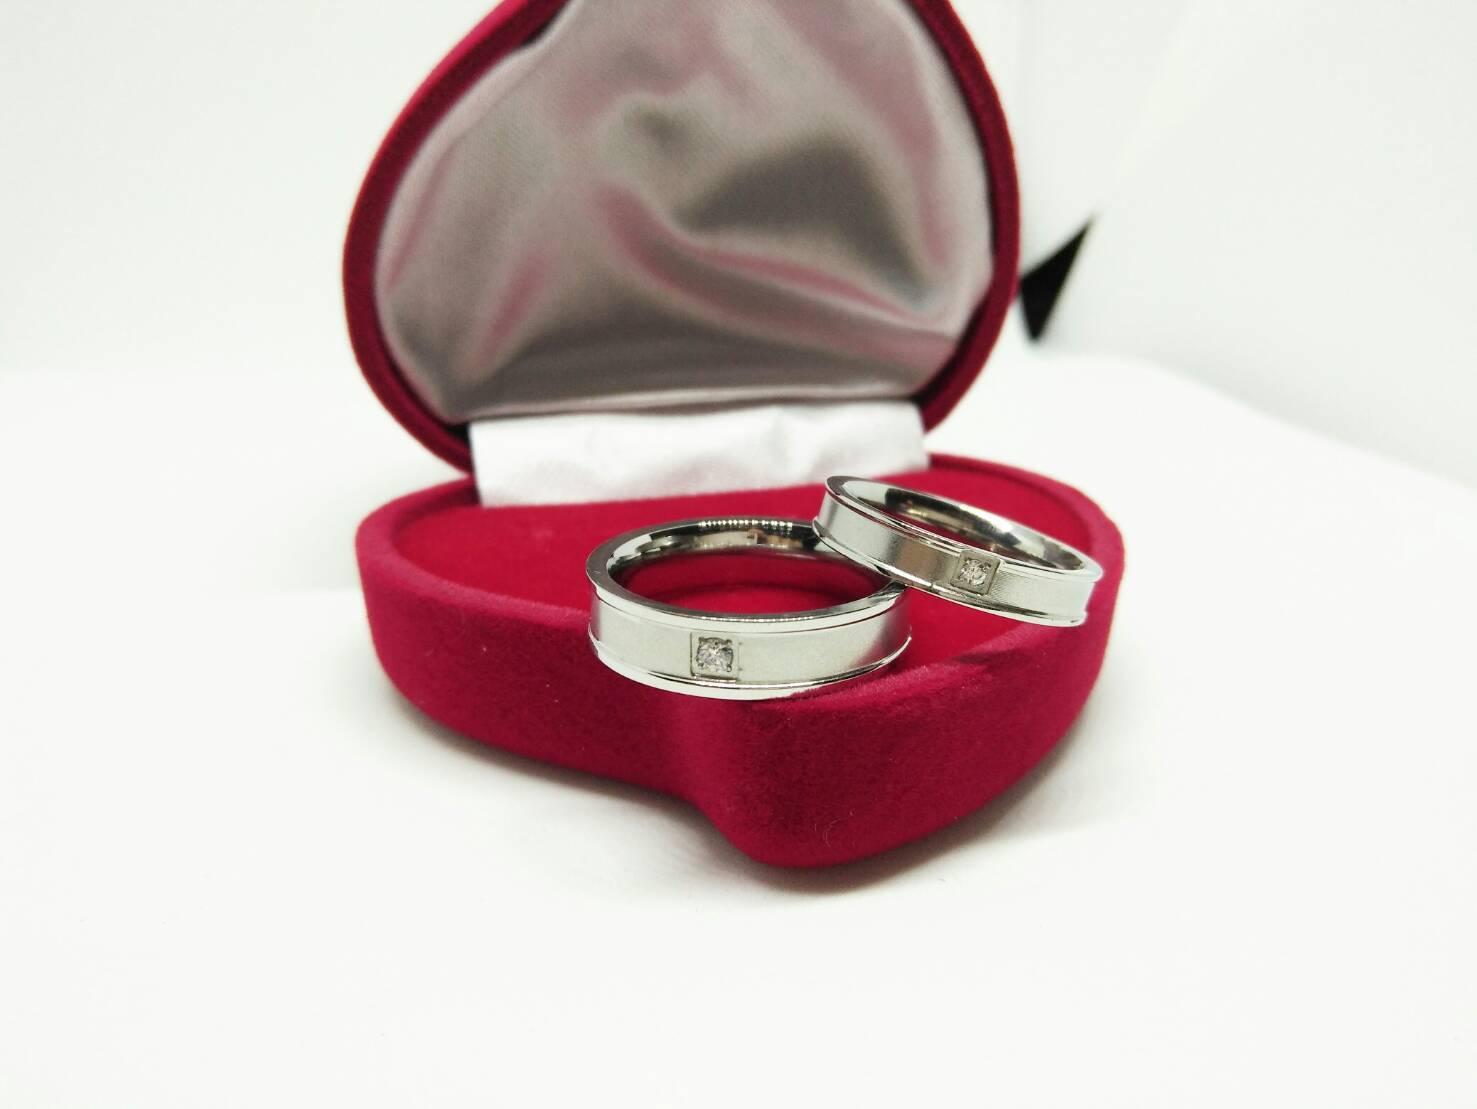 cincin couple / cincin tunangan / cincin nikah titanium anti karat dan hitam - 99